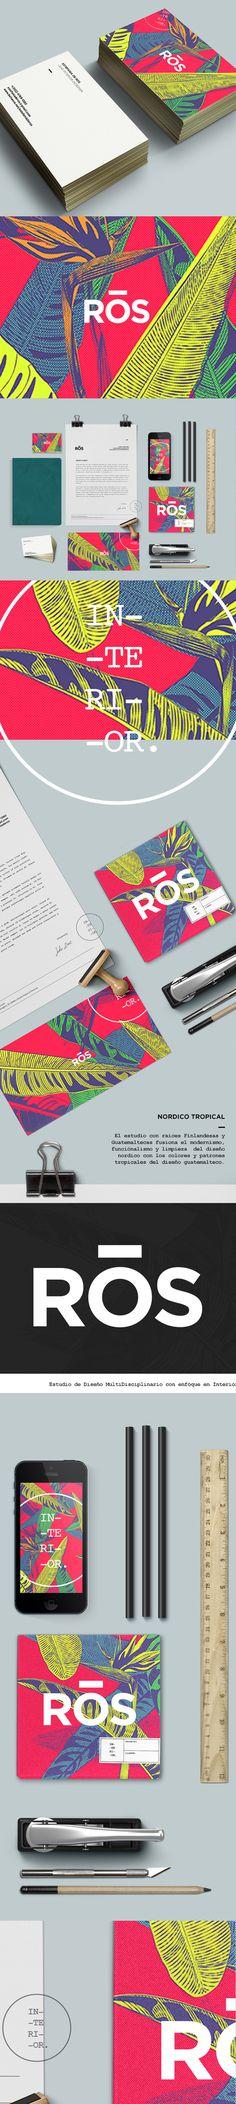 Ros Interior Design on Behance #design #identity